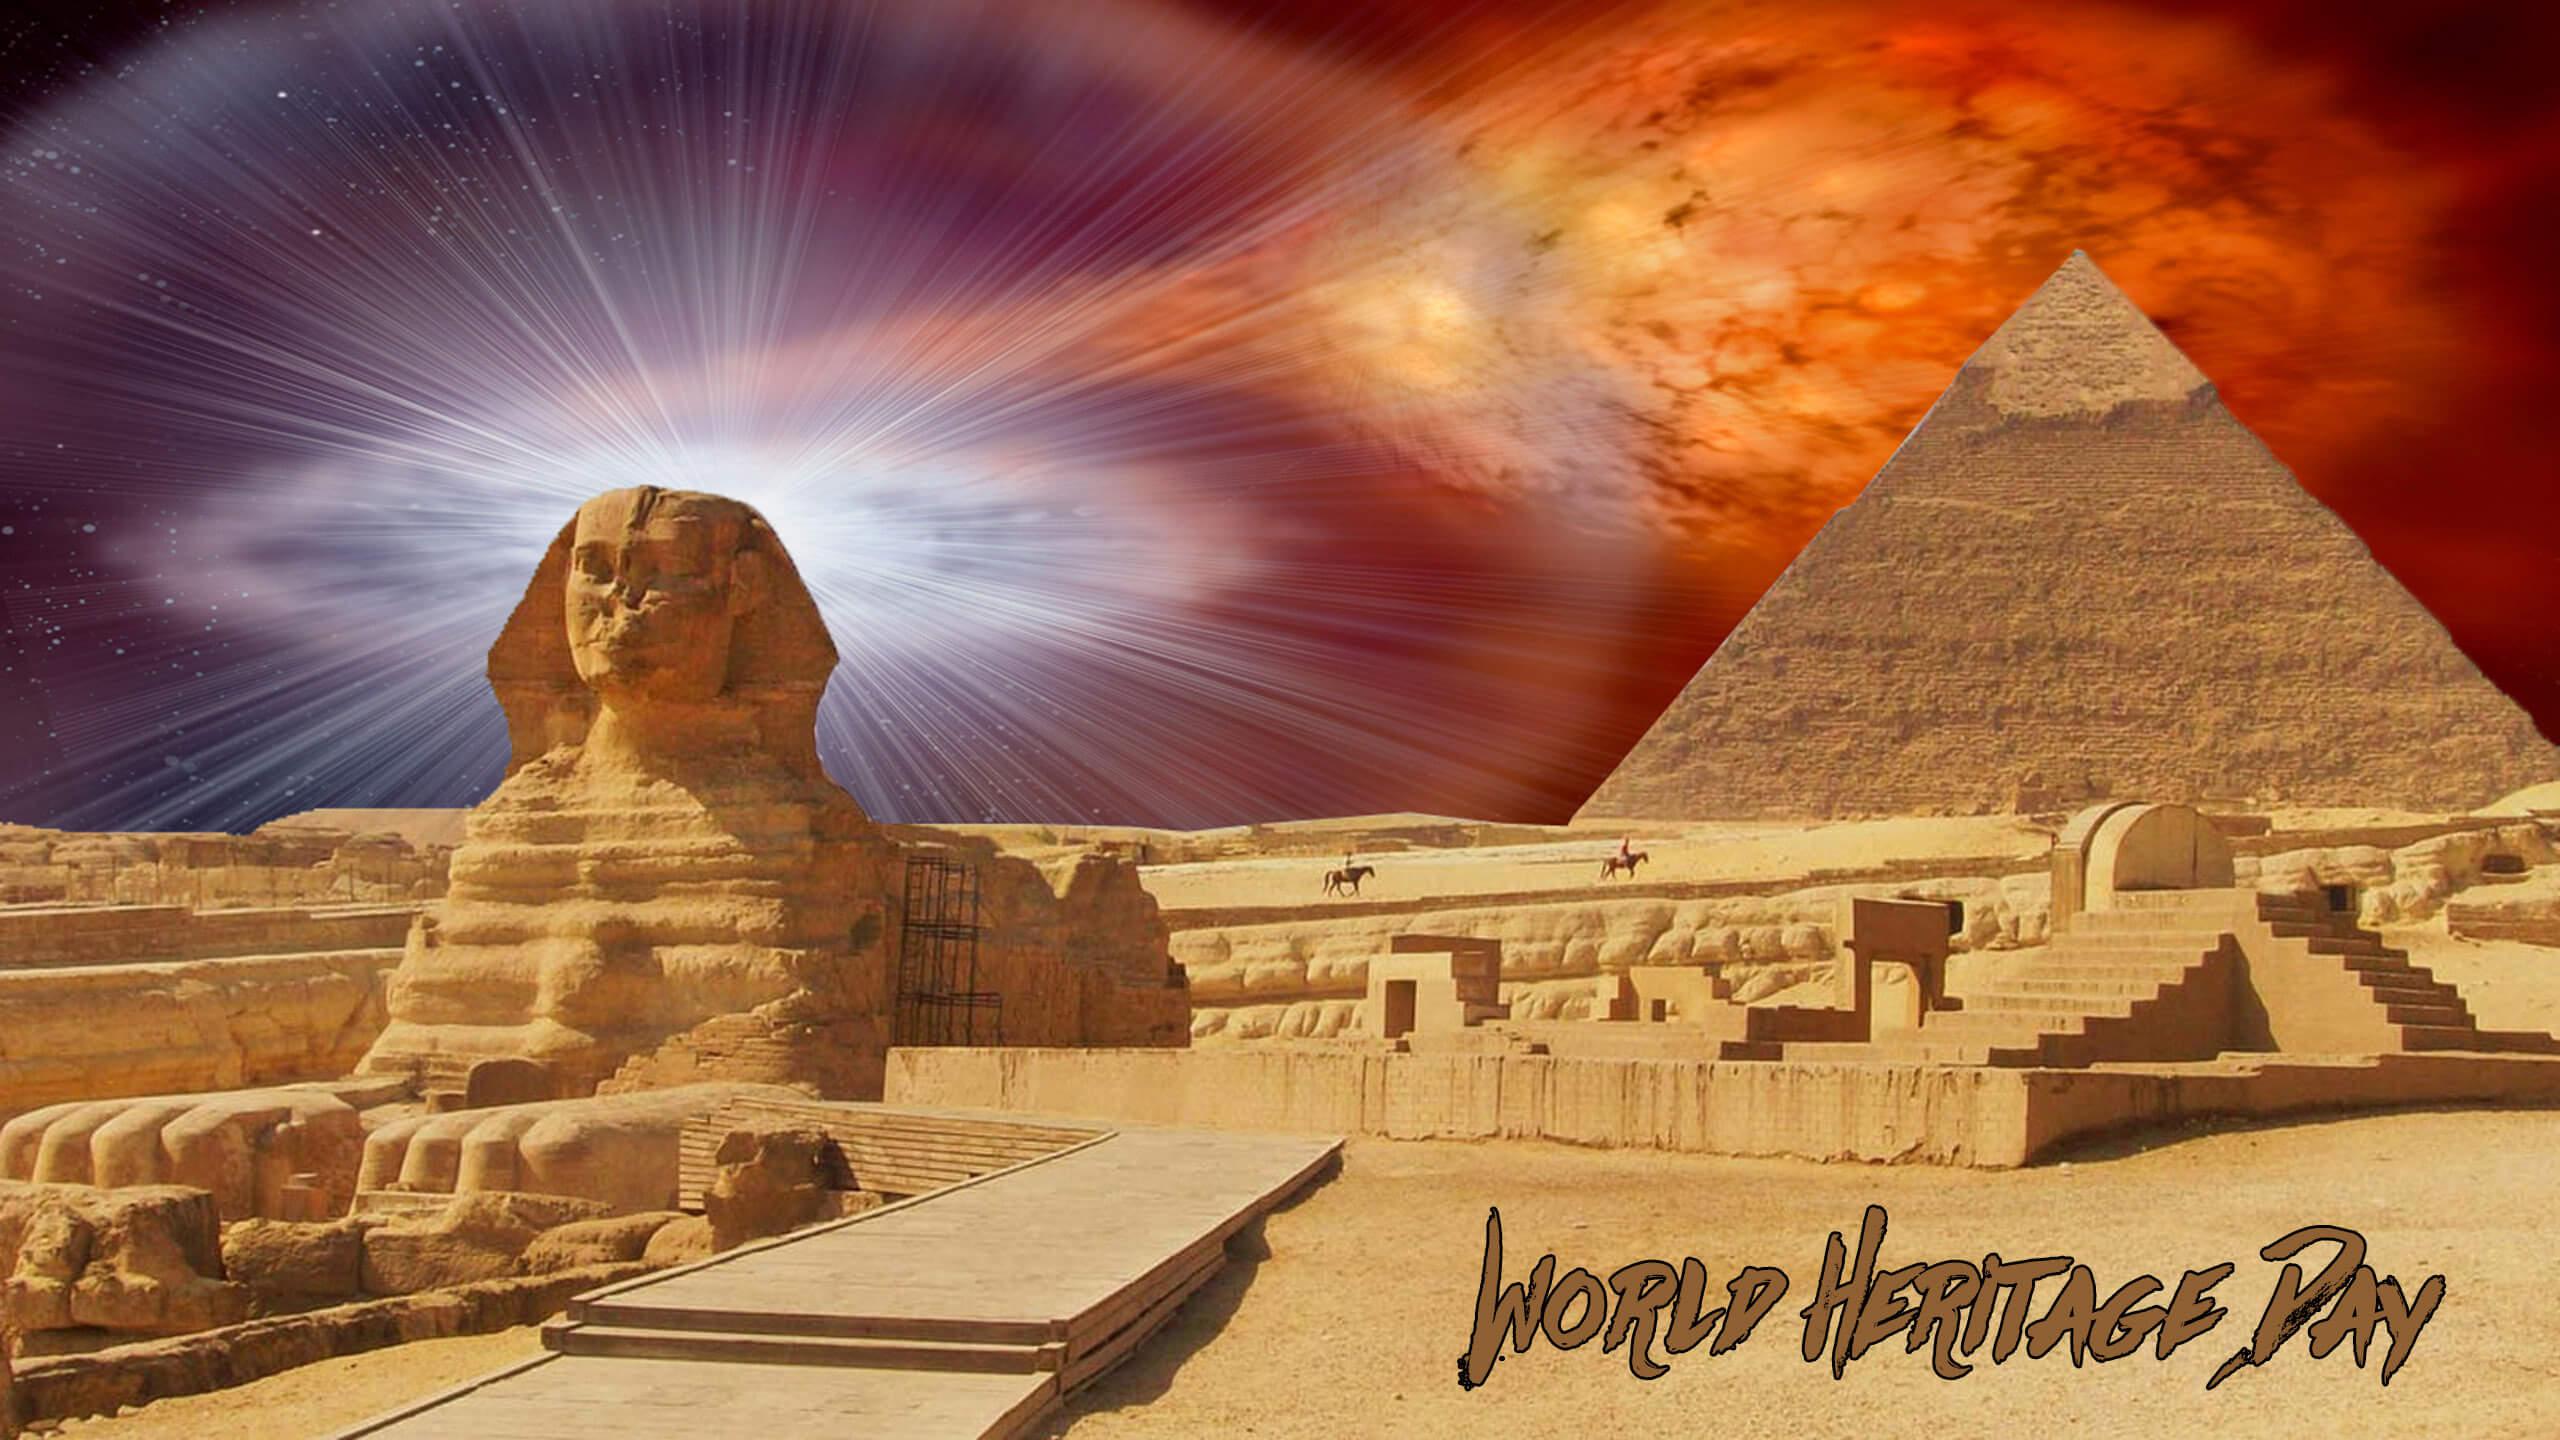 world heritage day egypt pyramid sphinx laptop hd wallpaper